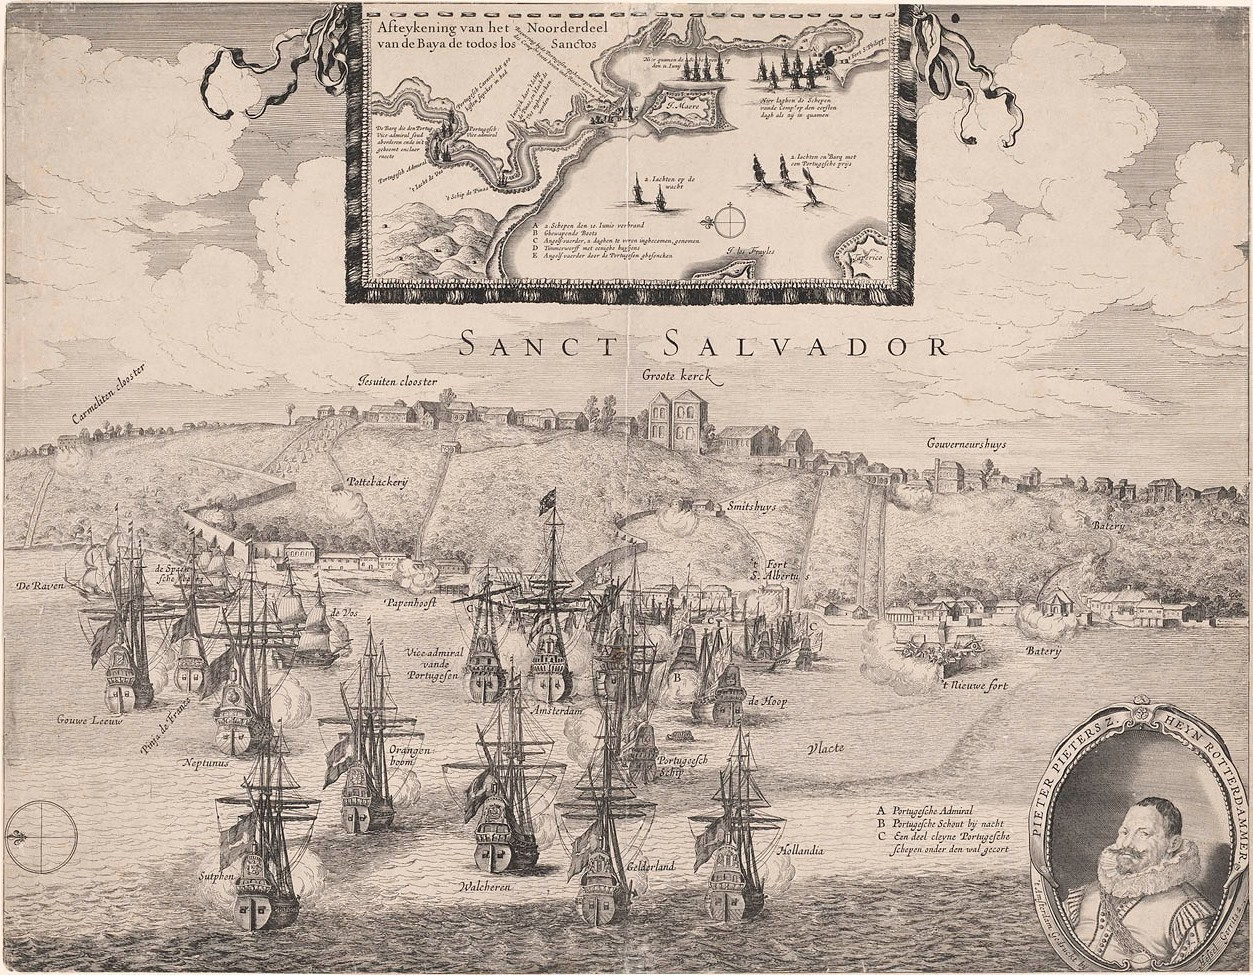 Documentário sobre a Baía de Todos os Santos